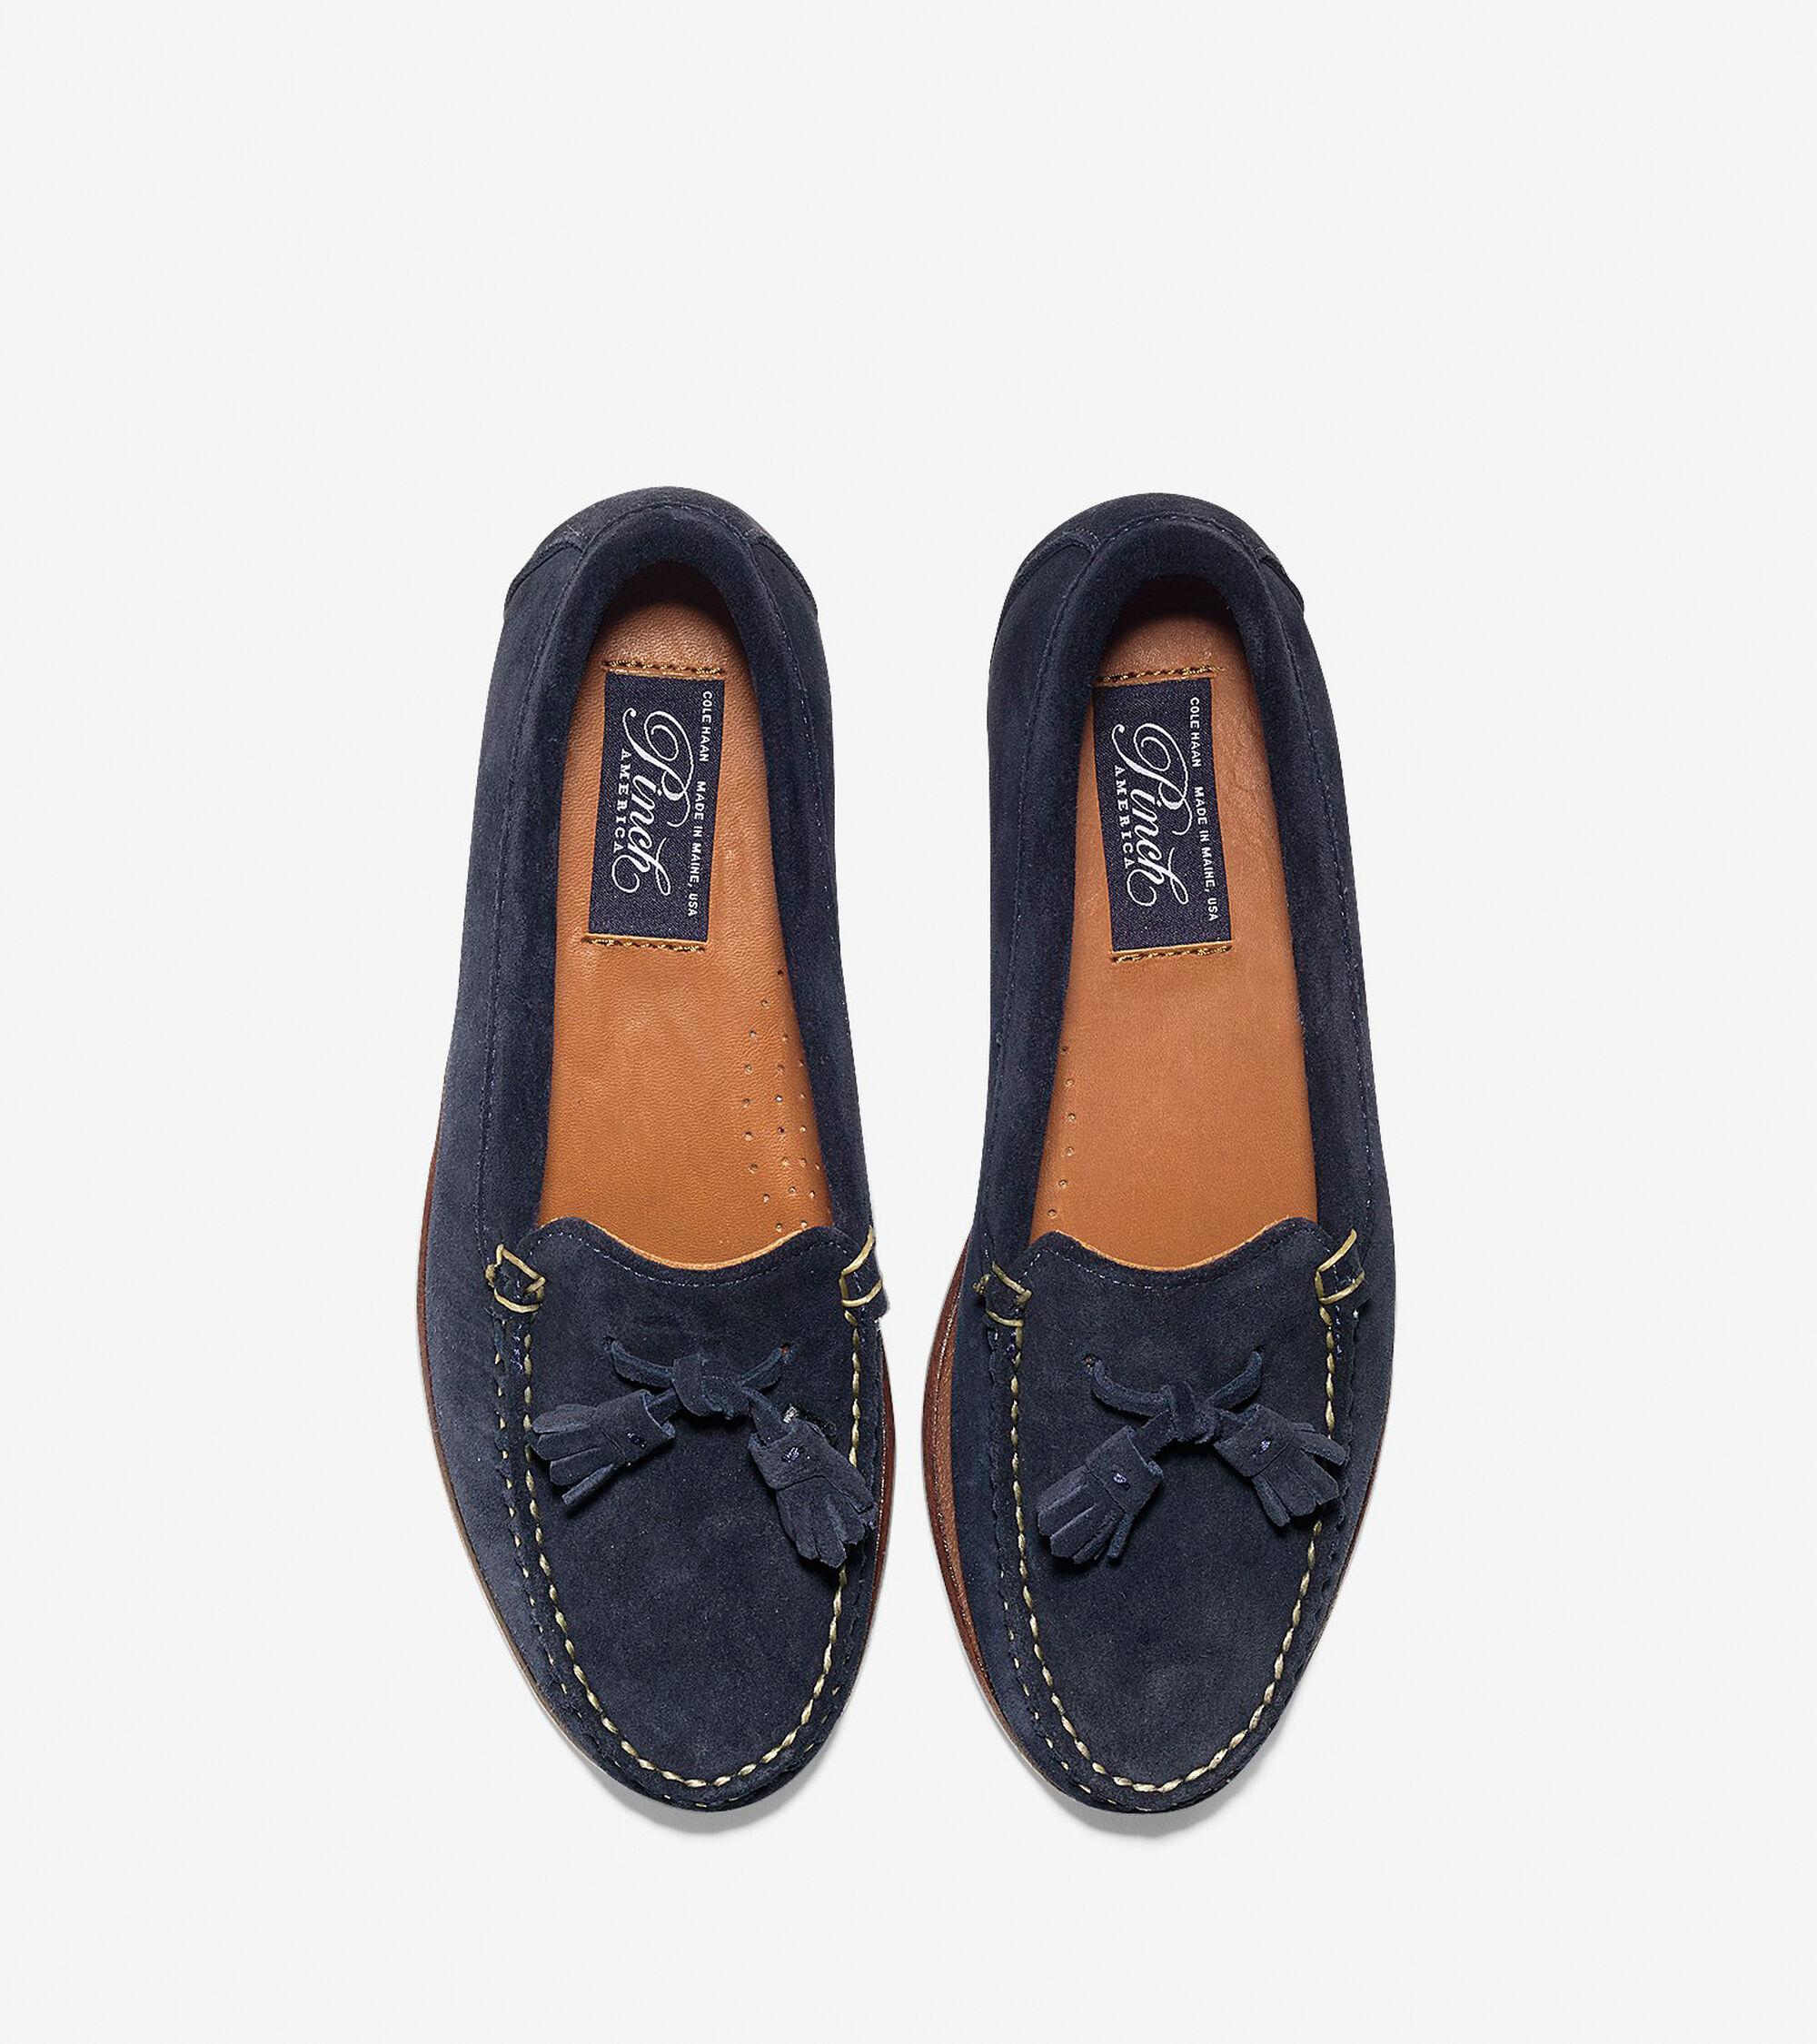 847fd7481e1 Pinch America Tassel Loafers in Blue Suede